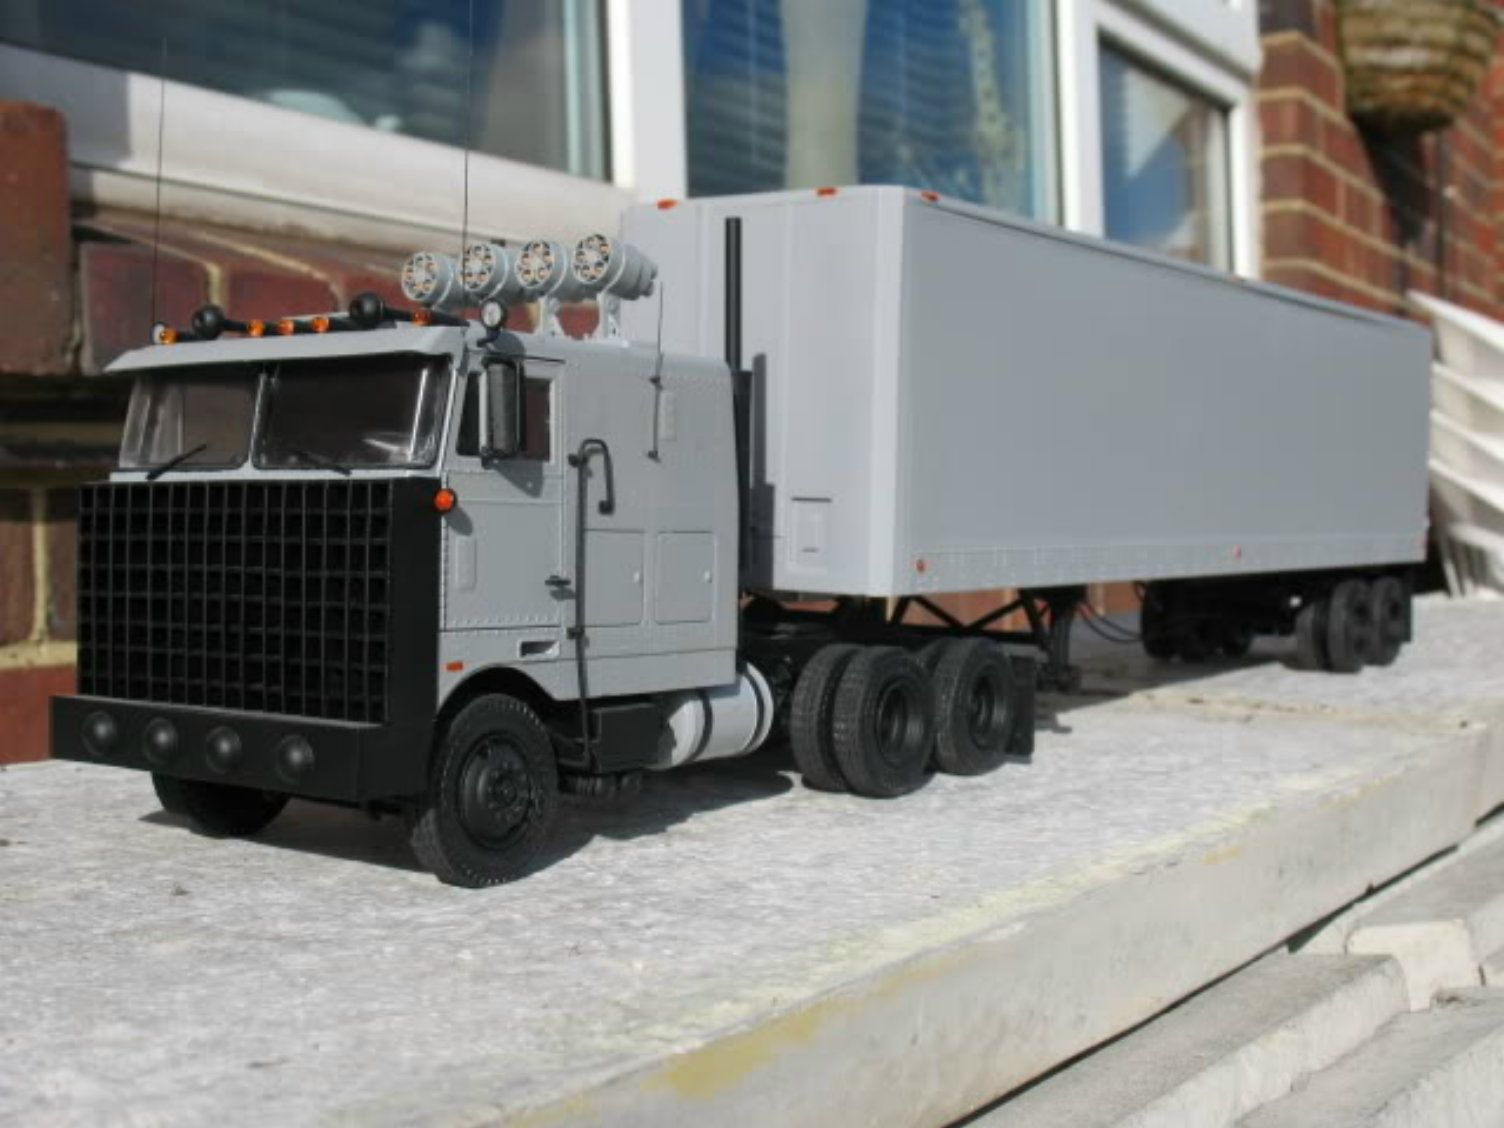 goliath knight rider tv series 1982 1986 trucks. Black Bedroom Furniture Sets. Home Design Ideas